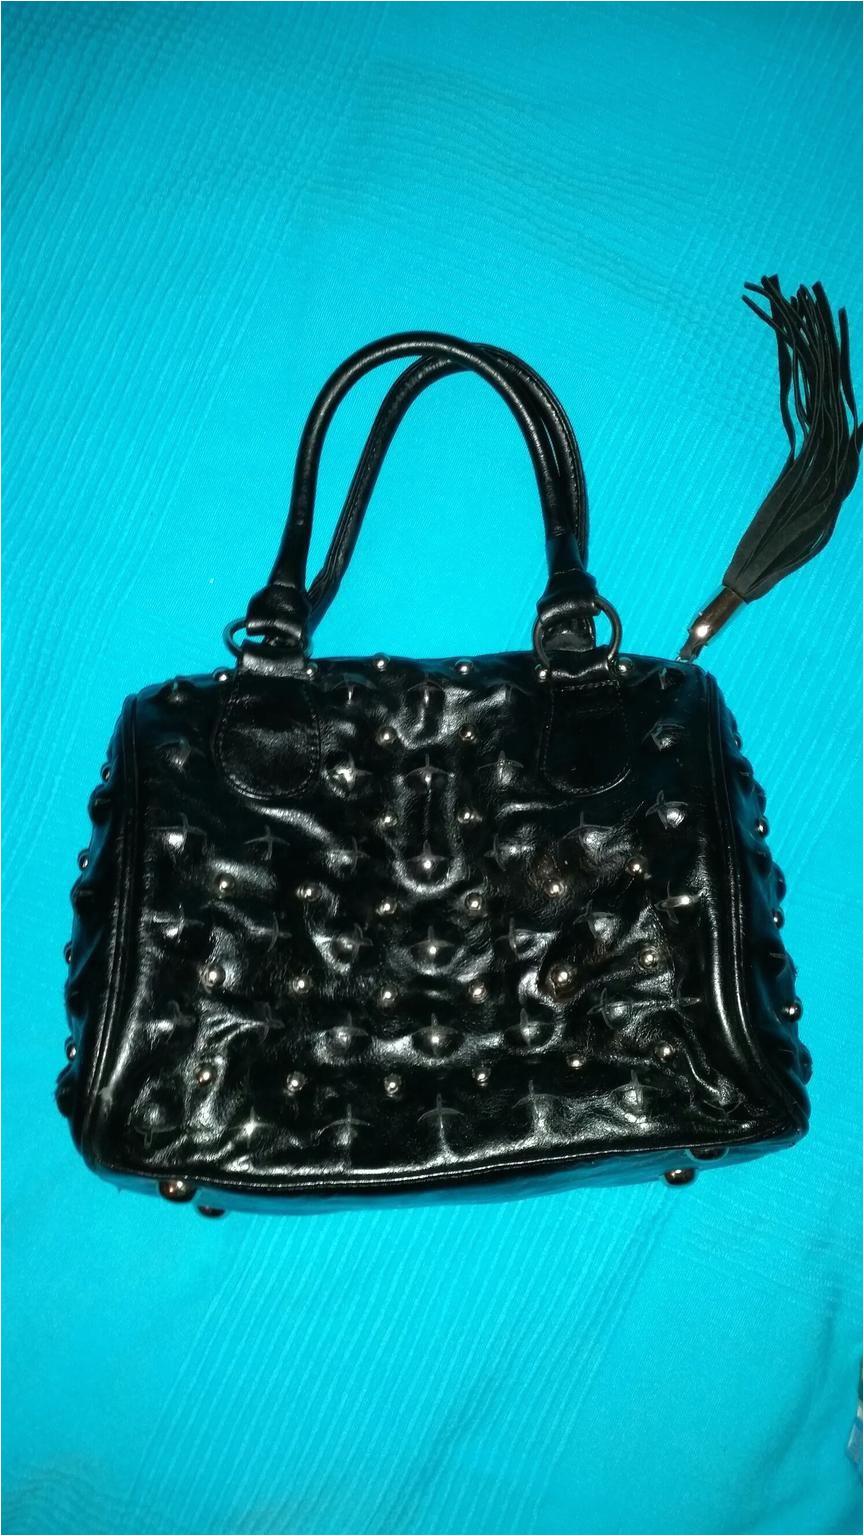 schwarze handtasche 6e72b6c6 jpg